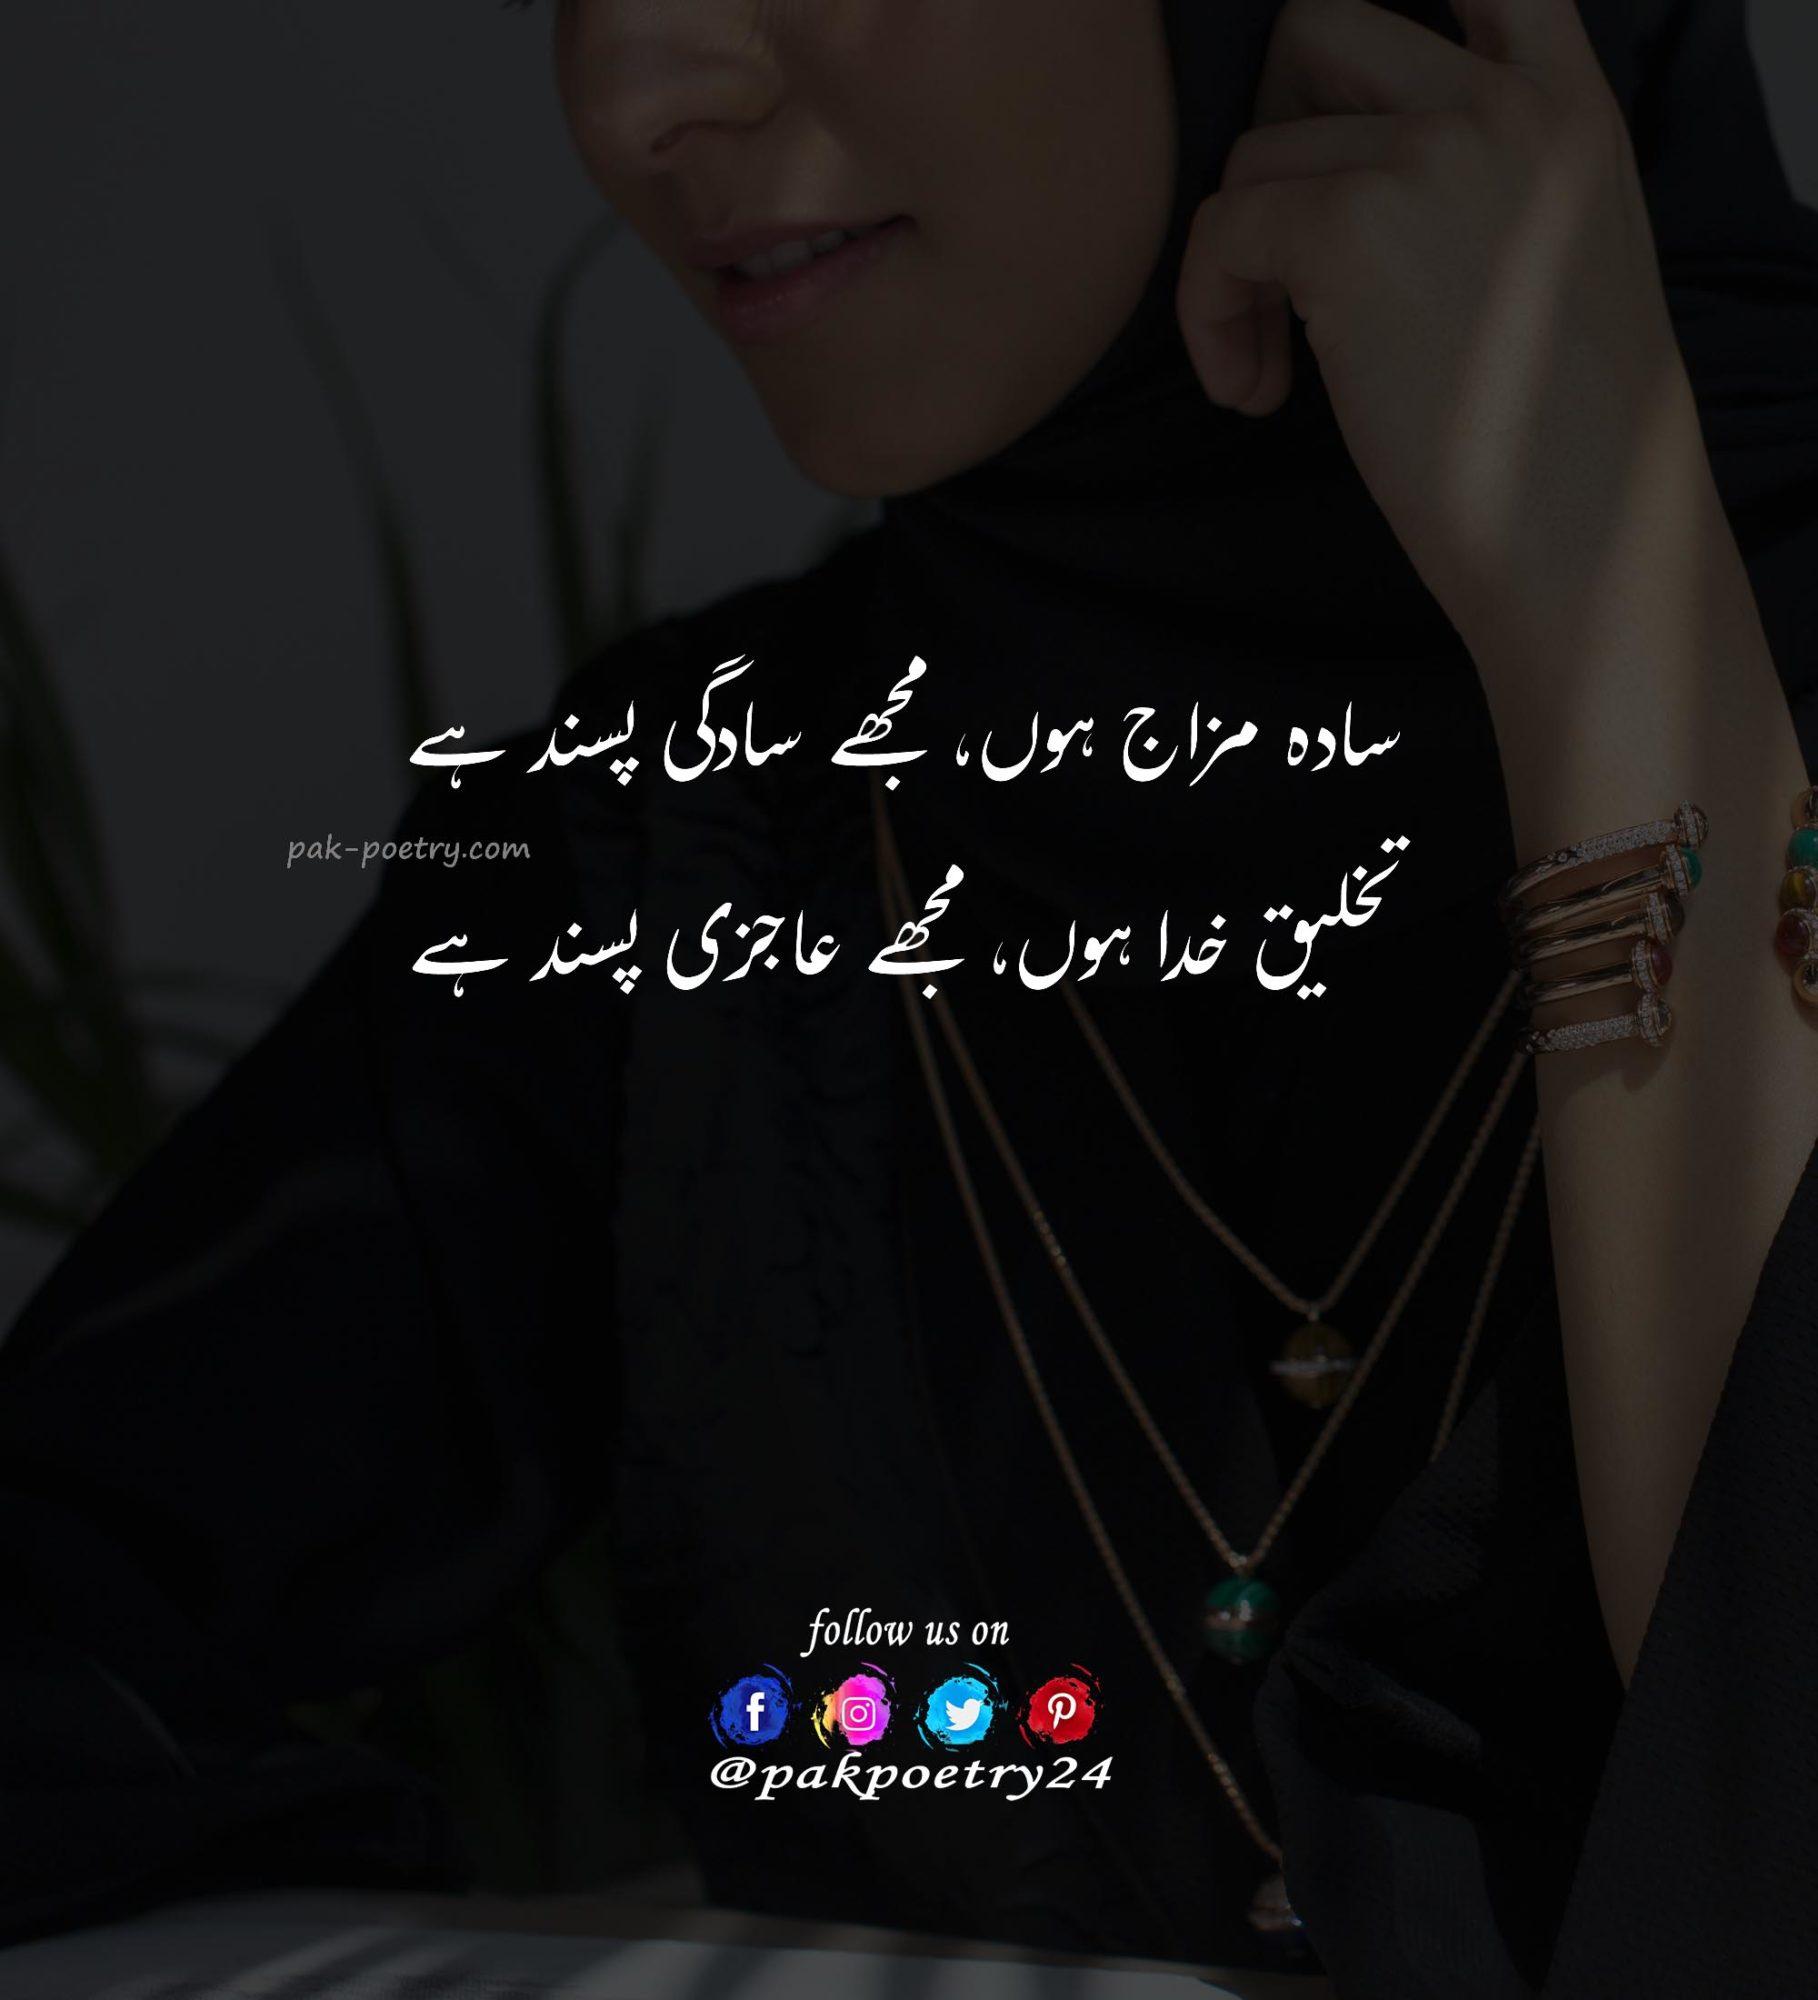 urdu poetry, poetry in urdu, poetry urdu, poetry, urdu shayari, potry in urdu, baat poetry, poetry.in.urdu, urdu poetry pic, poetry into urdu, urdu. poetry, porty urdu, urdu pietry,